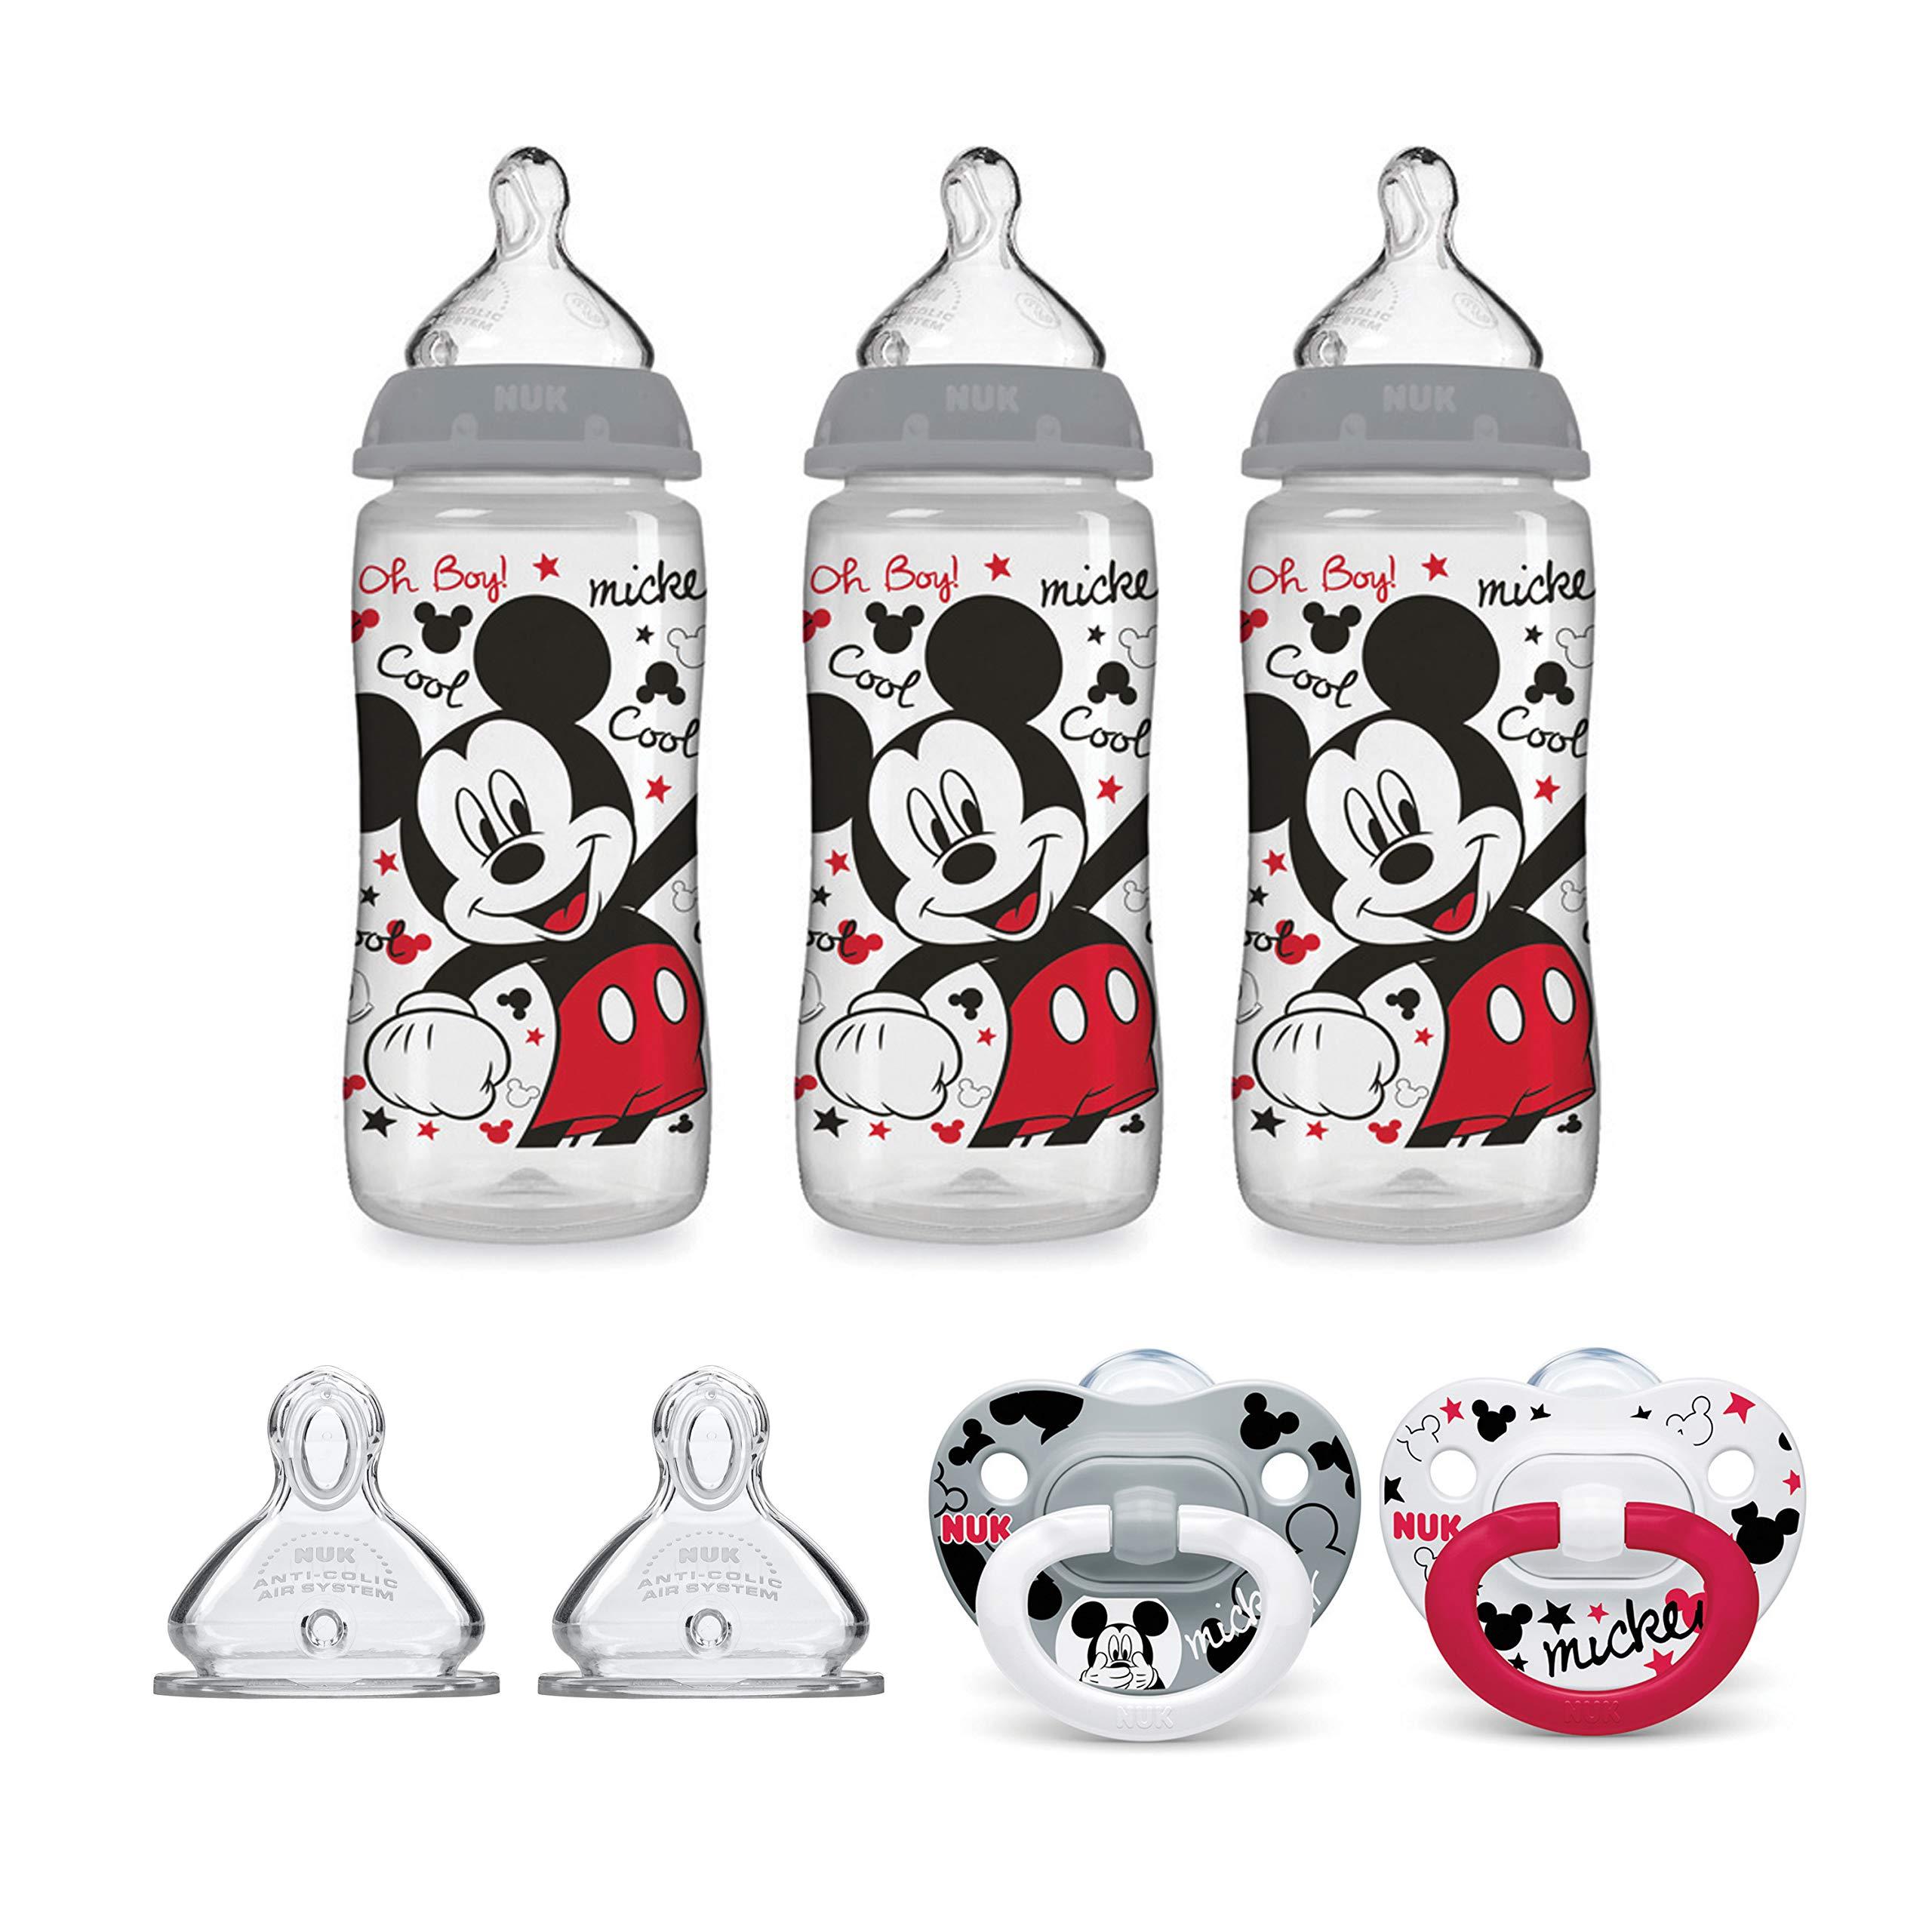 NUK Disney Baby Bottle & Pacifier Newborn Set, Mickey Mouse by NUK